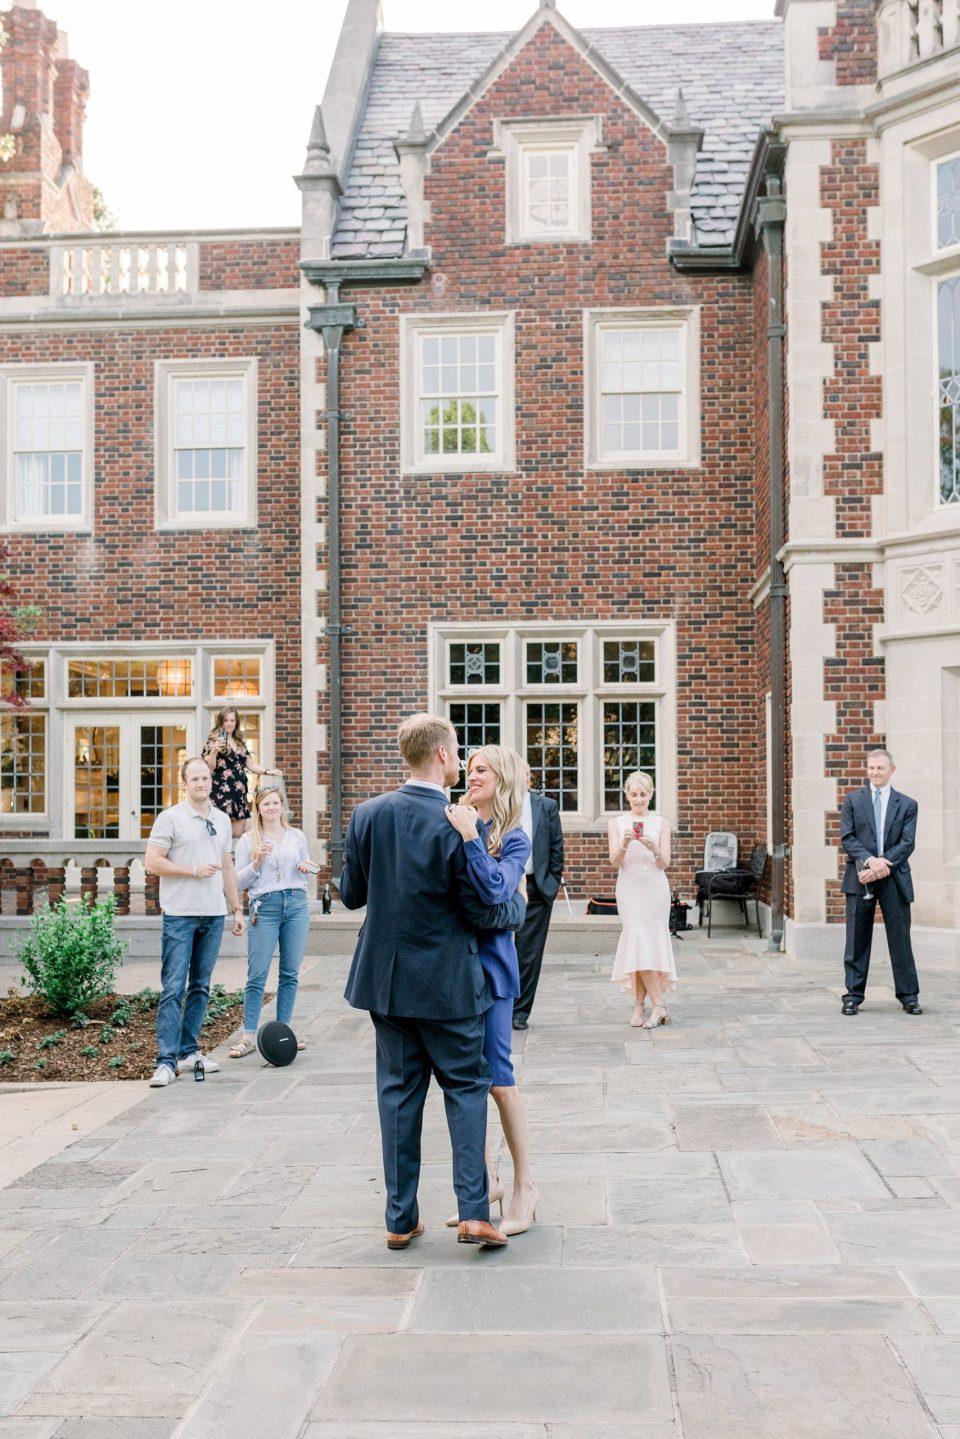 Bride and groom dancing in courtyard at Harwelden Mansion elopement